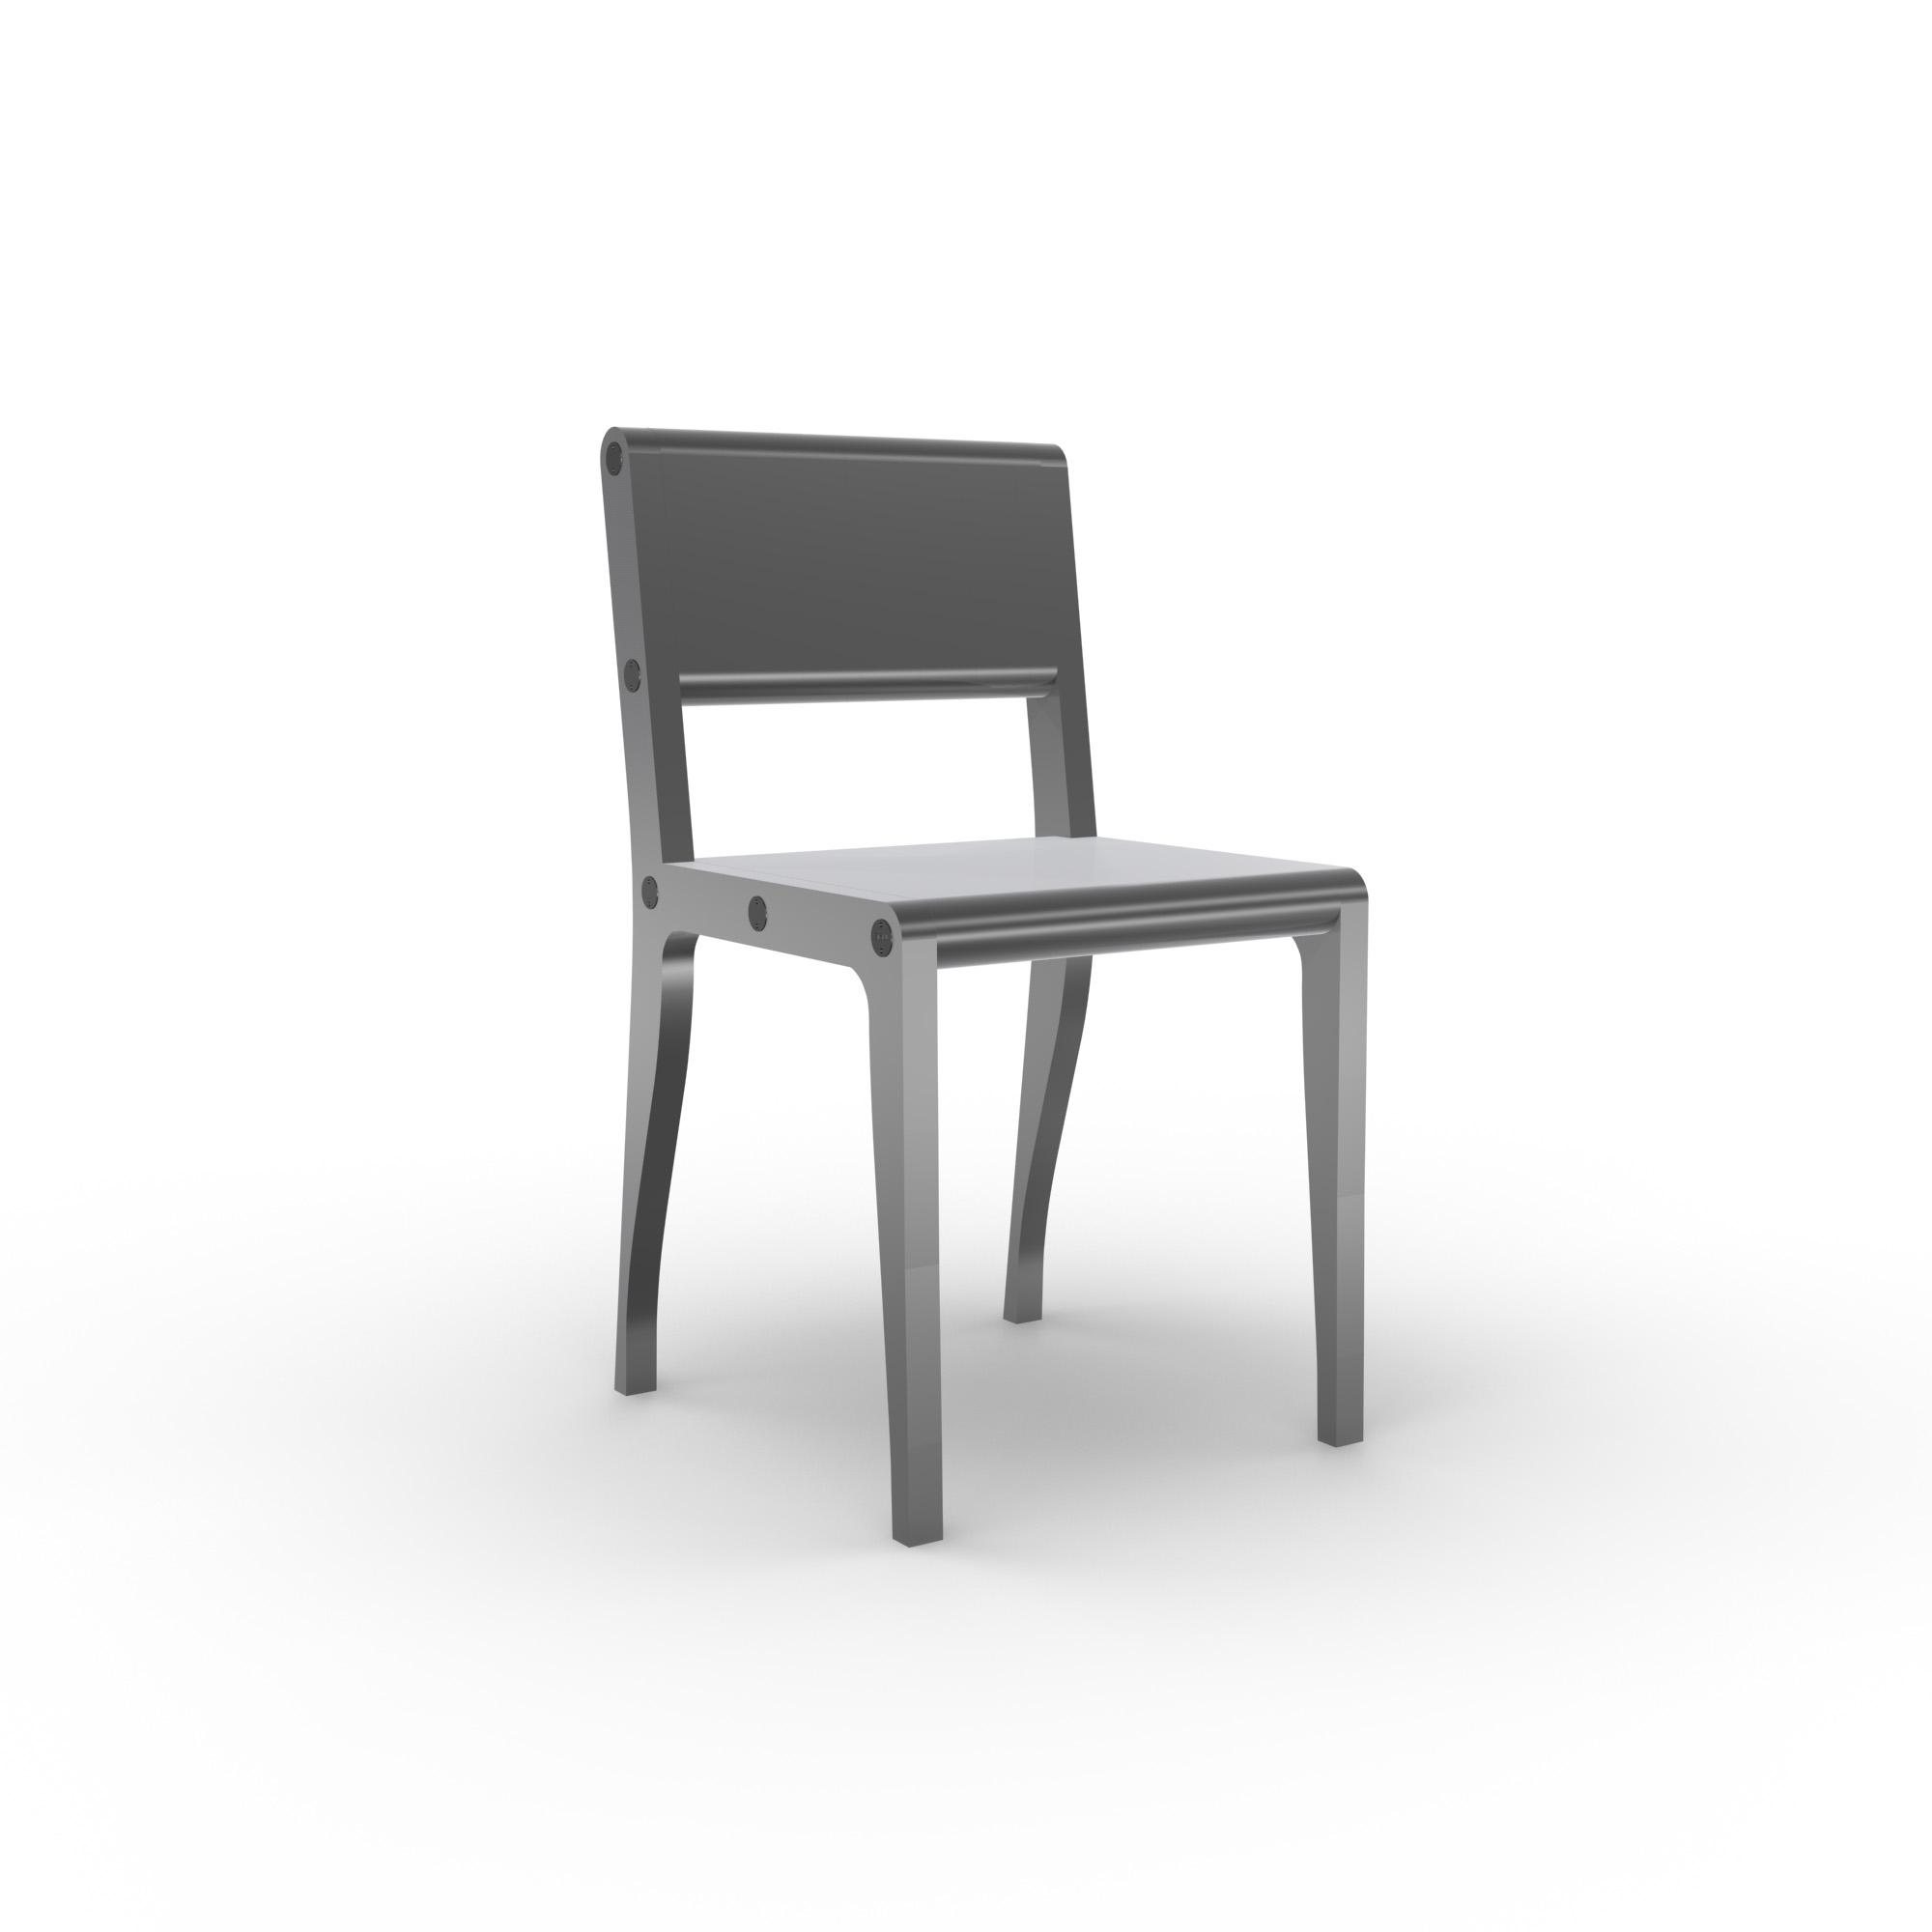 diseño industrial santander - Beusual - Sirak - silla alumino